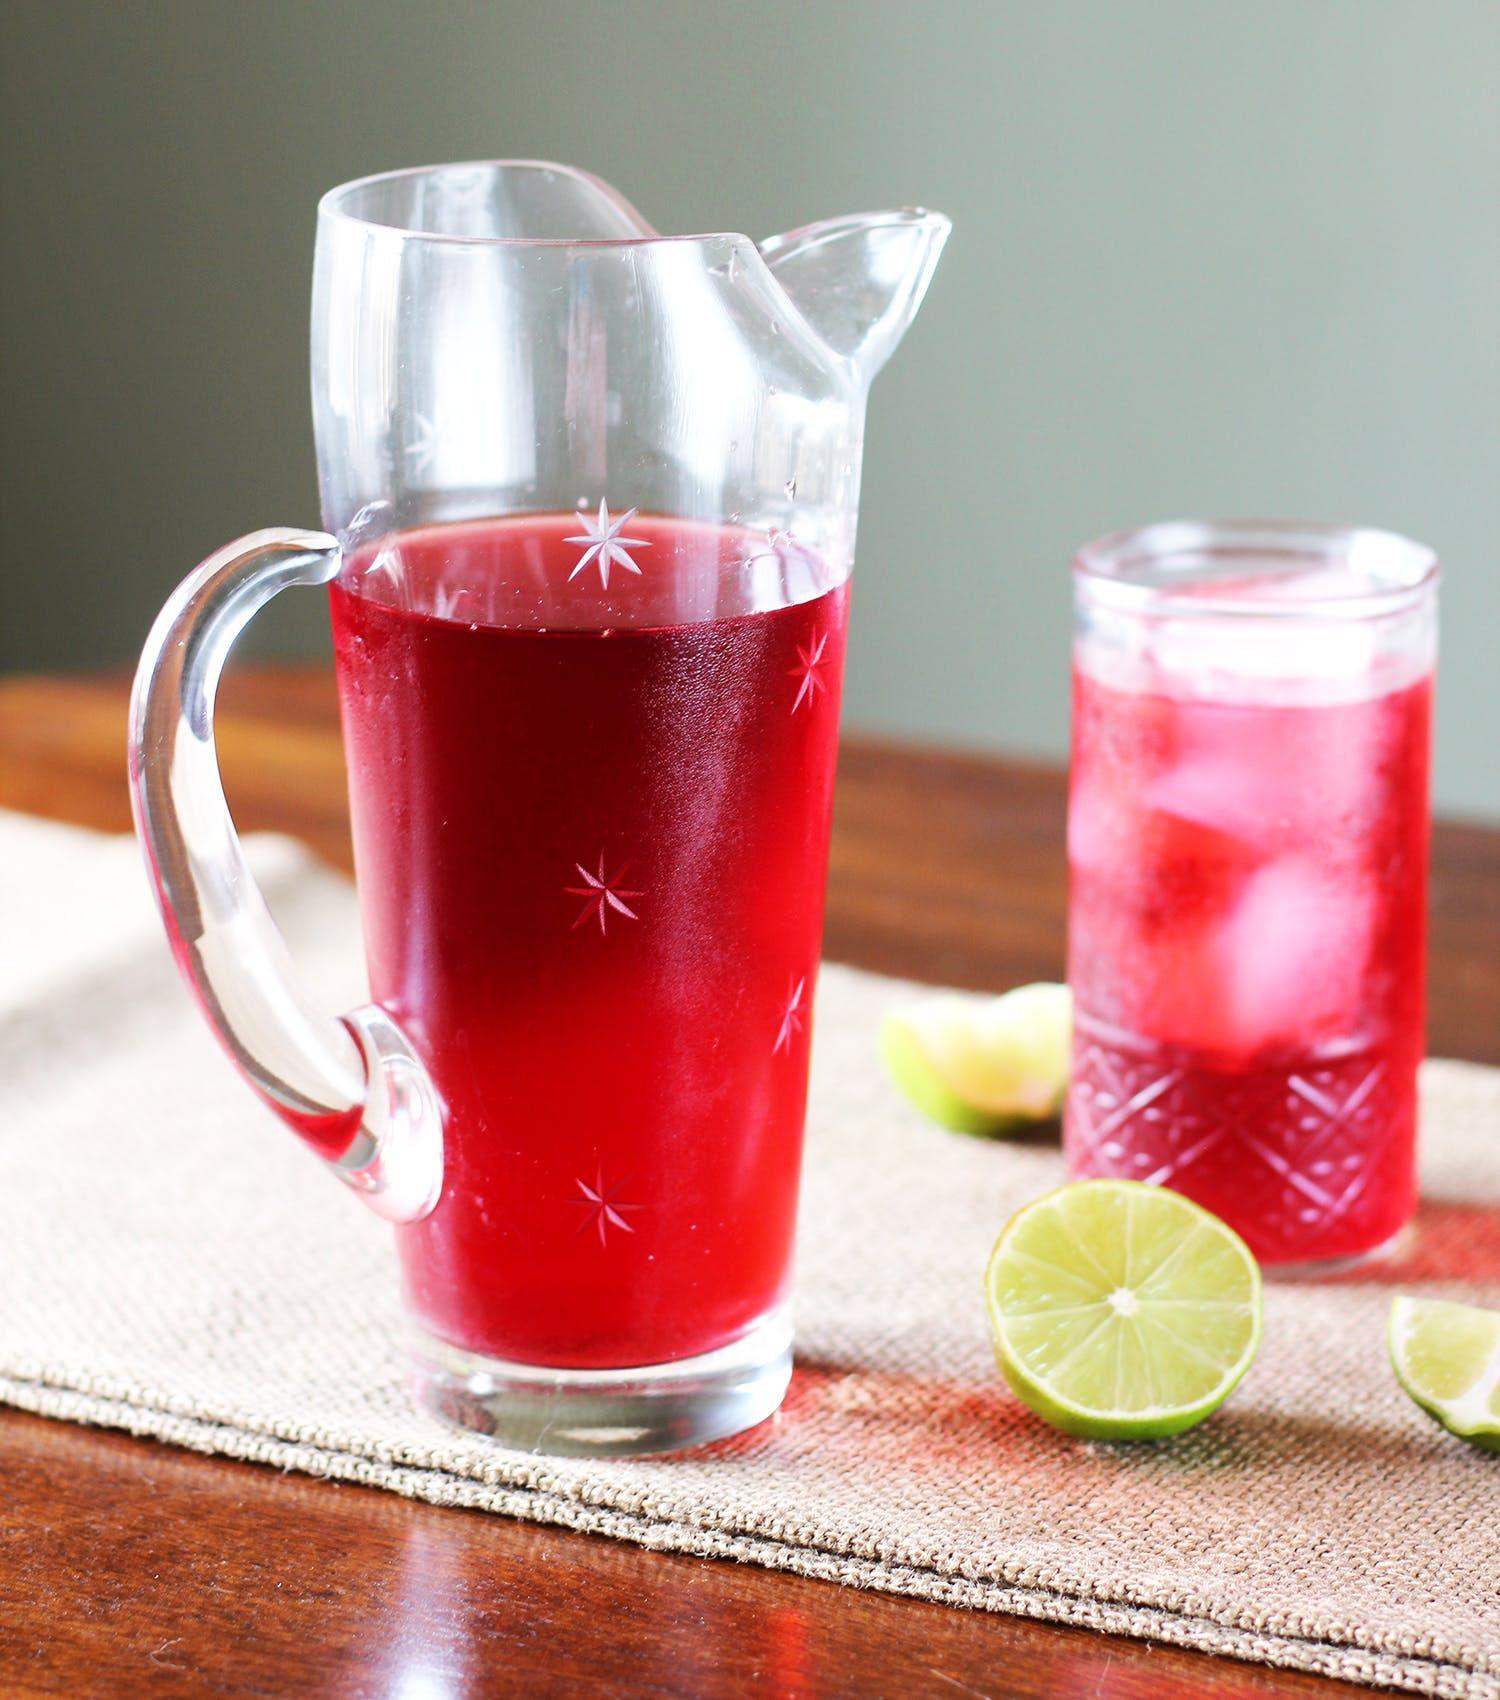 Cold brew jamaica hibiscus iced tea recipe cold brew iced tea cold brew jamaica hibiscus iced tea izmirmasajfo Choice Image